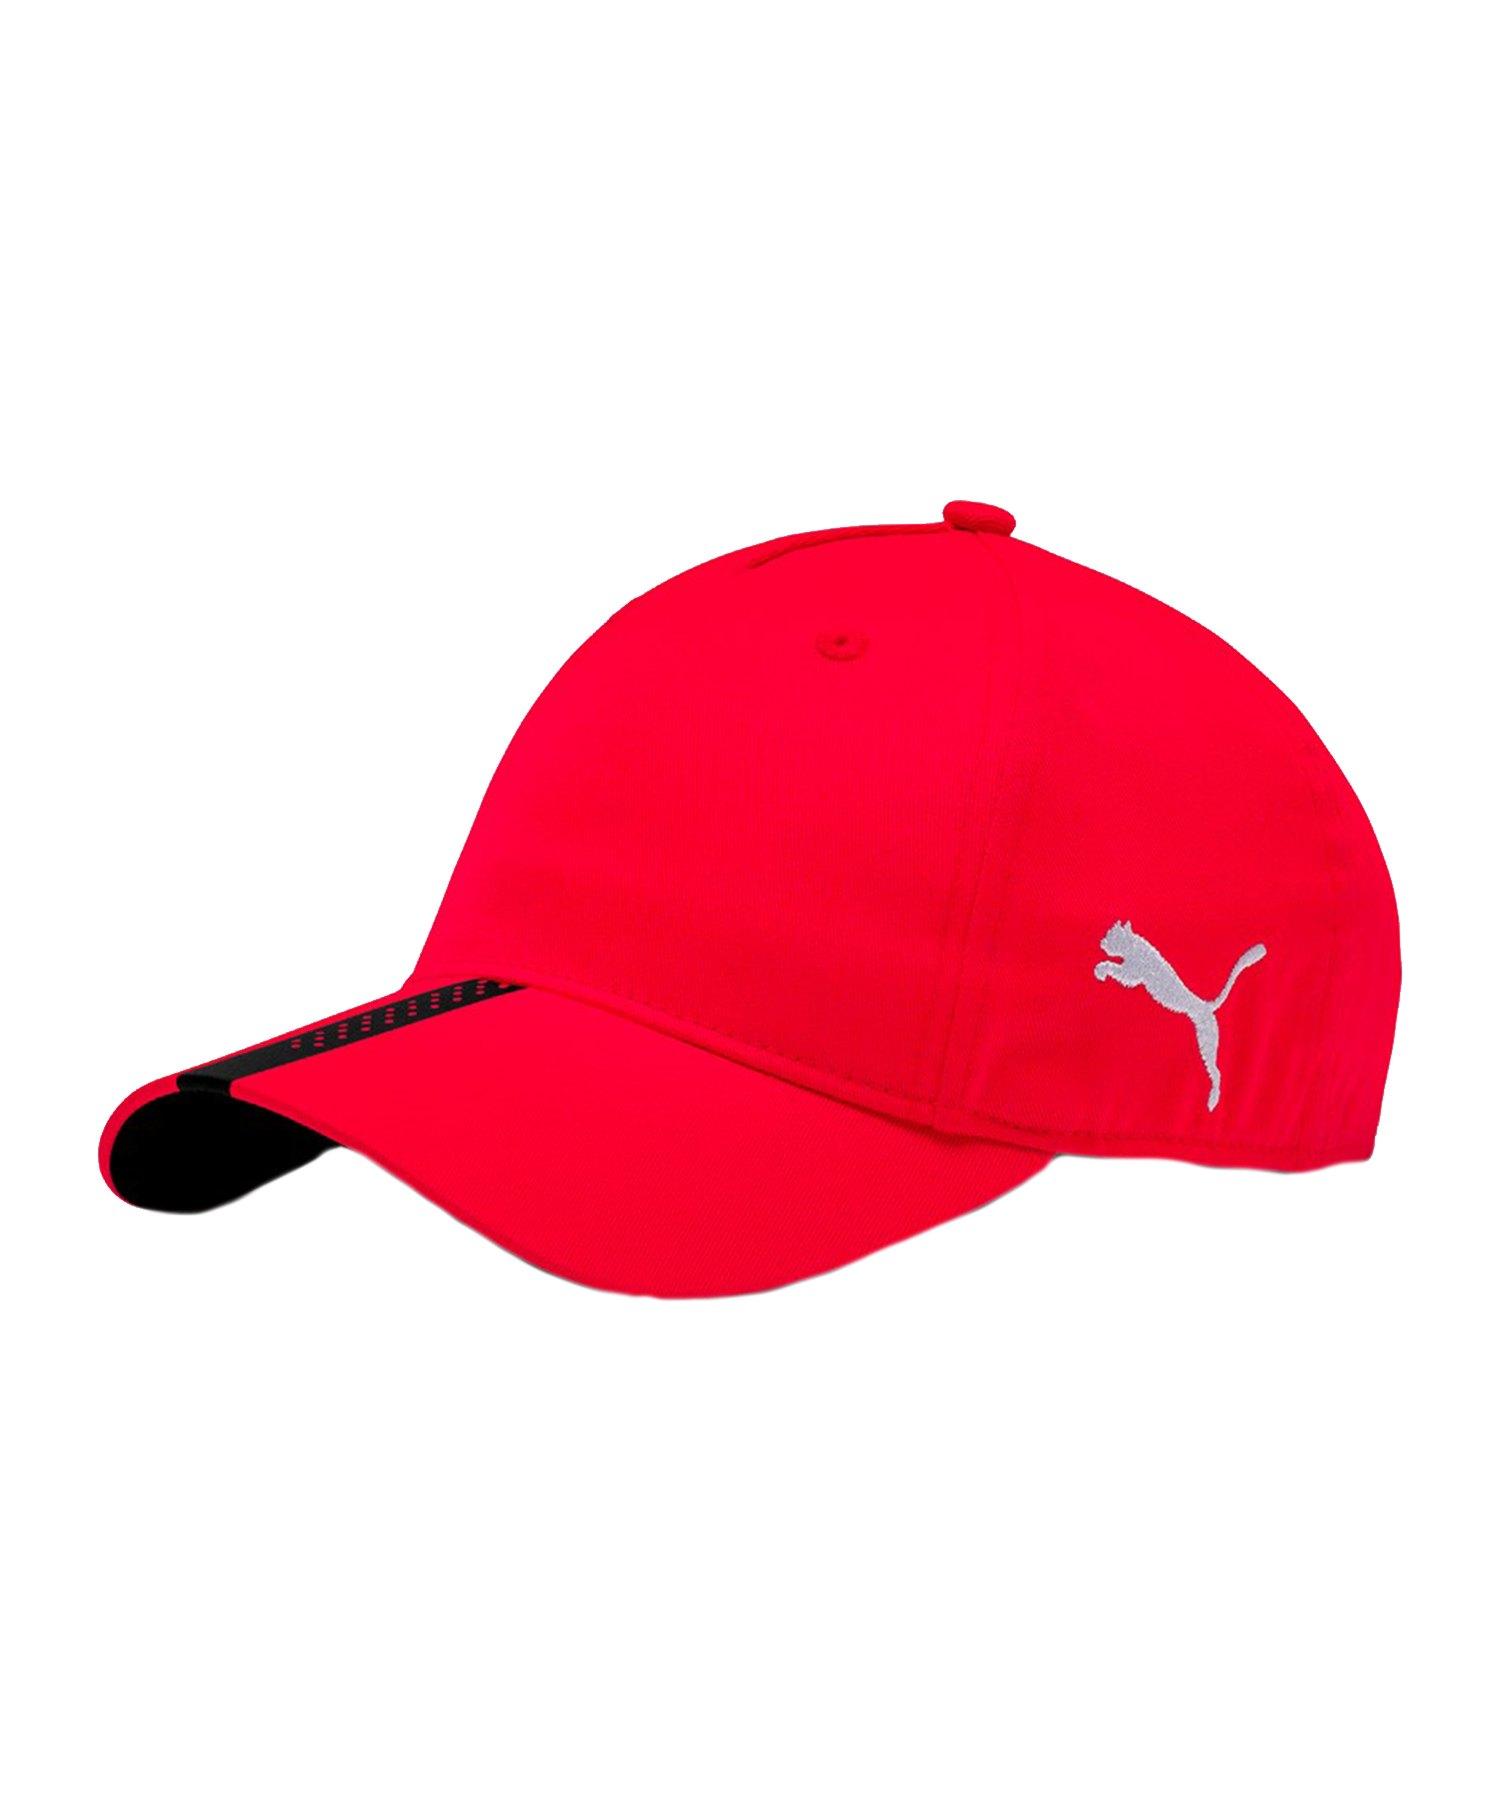 PUMA LIGA Cap Mütze Rot Schwarz F01 - Rot